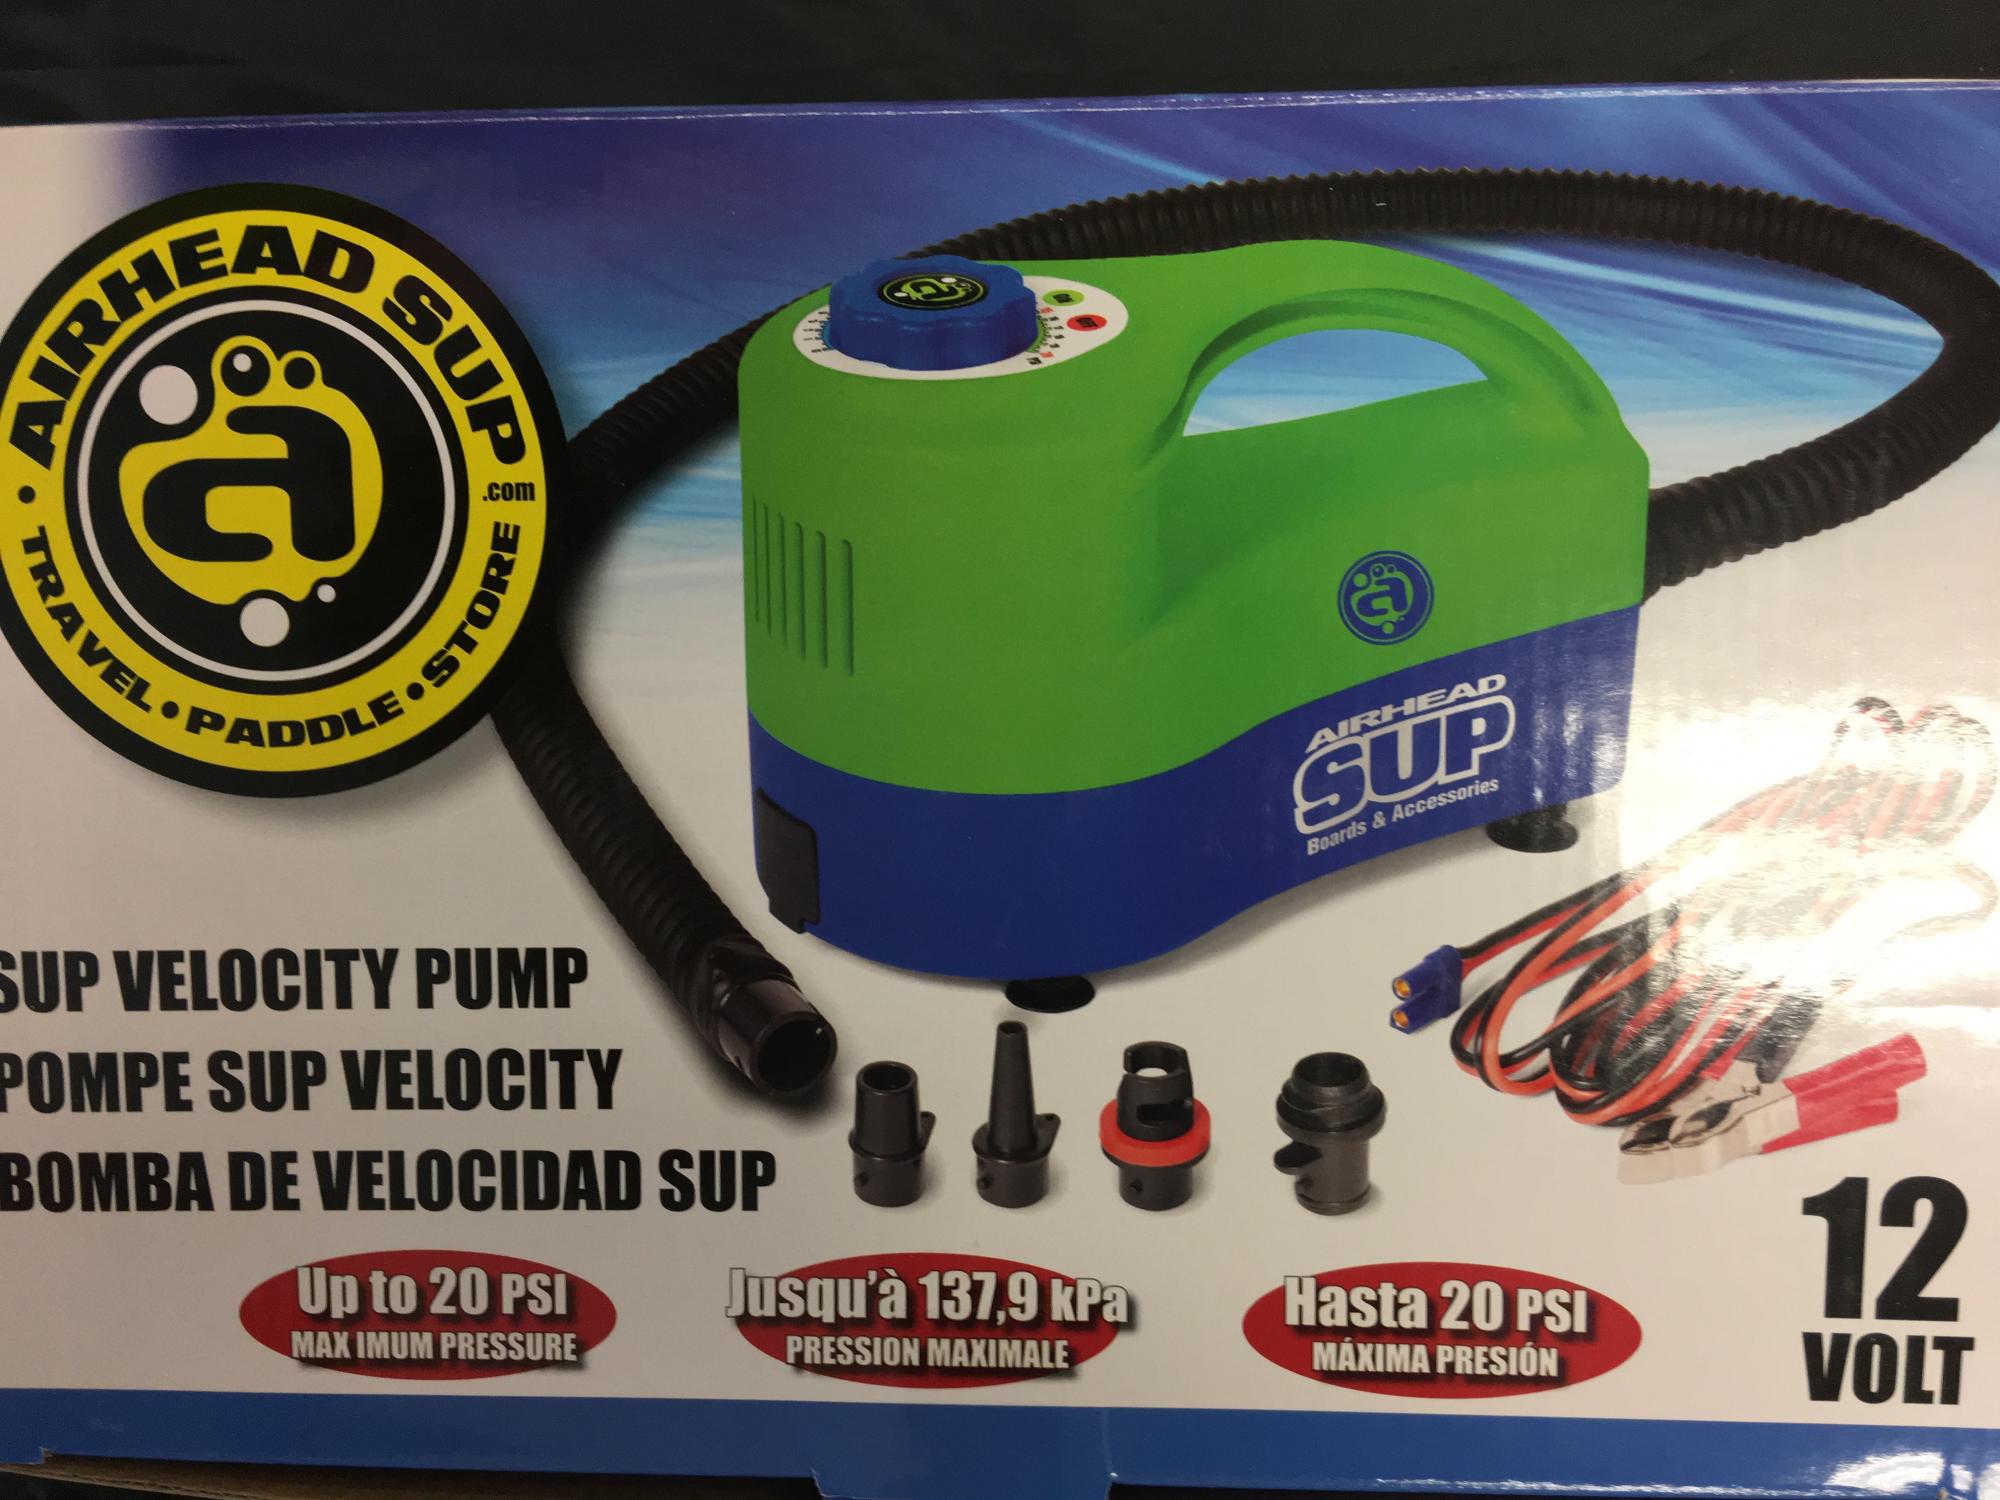 Airhead SUP Velocity Pump